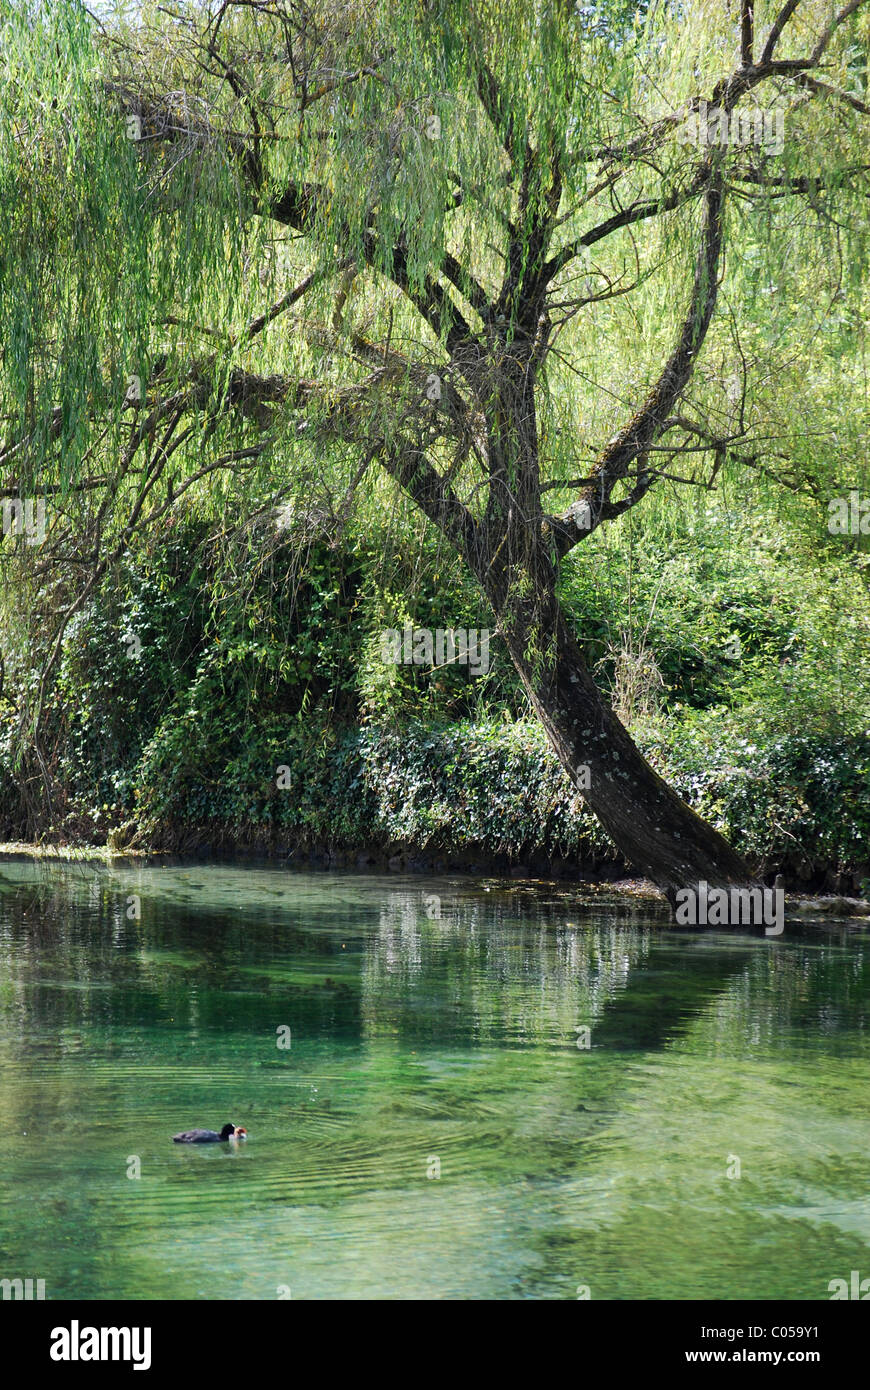 Lake of Posta Fibreno - Stock Image